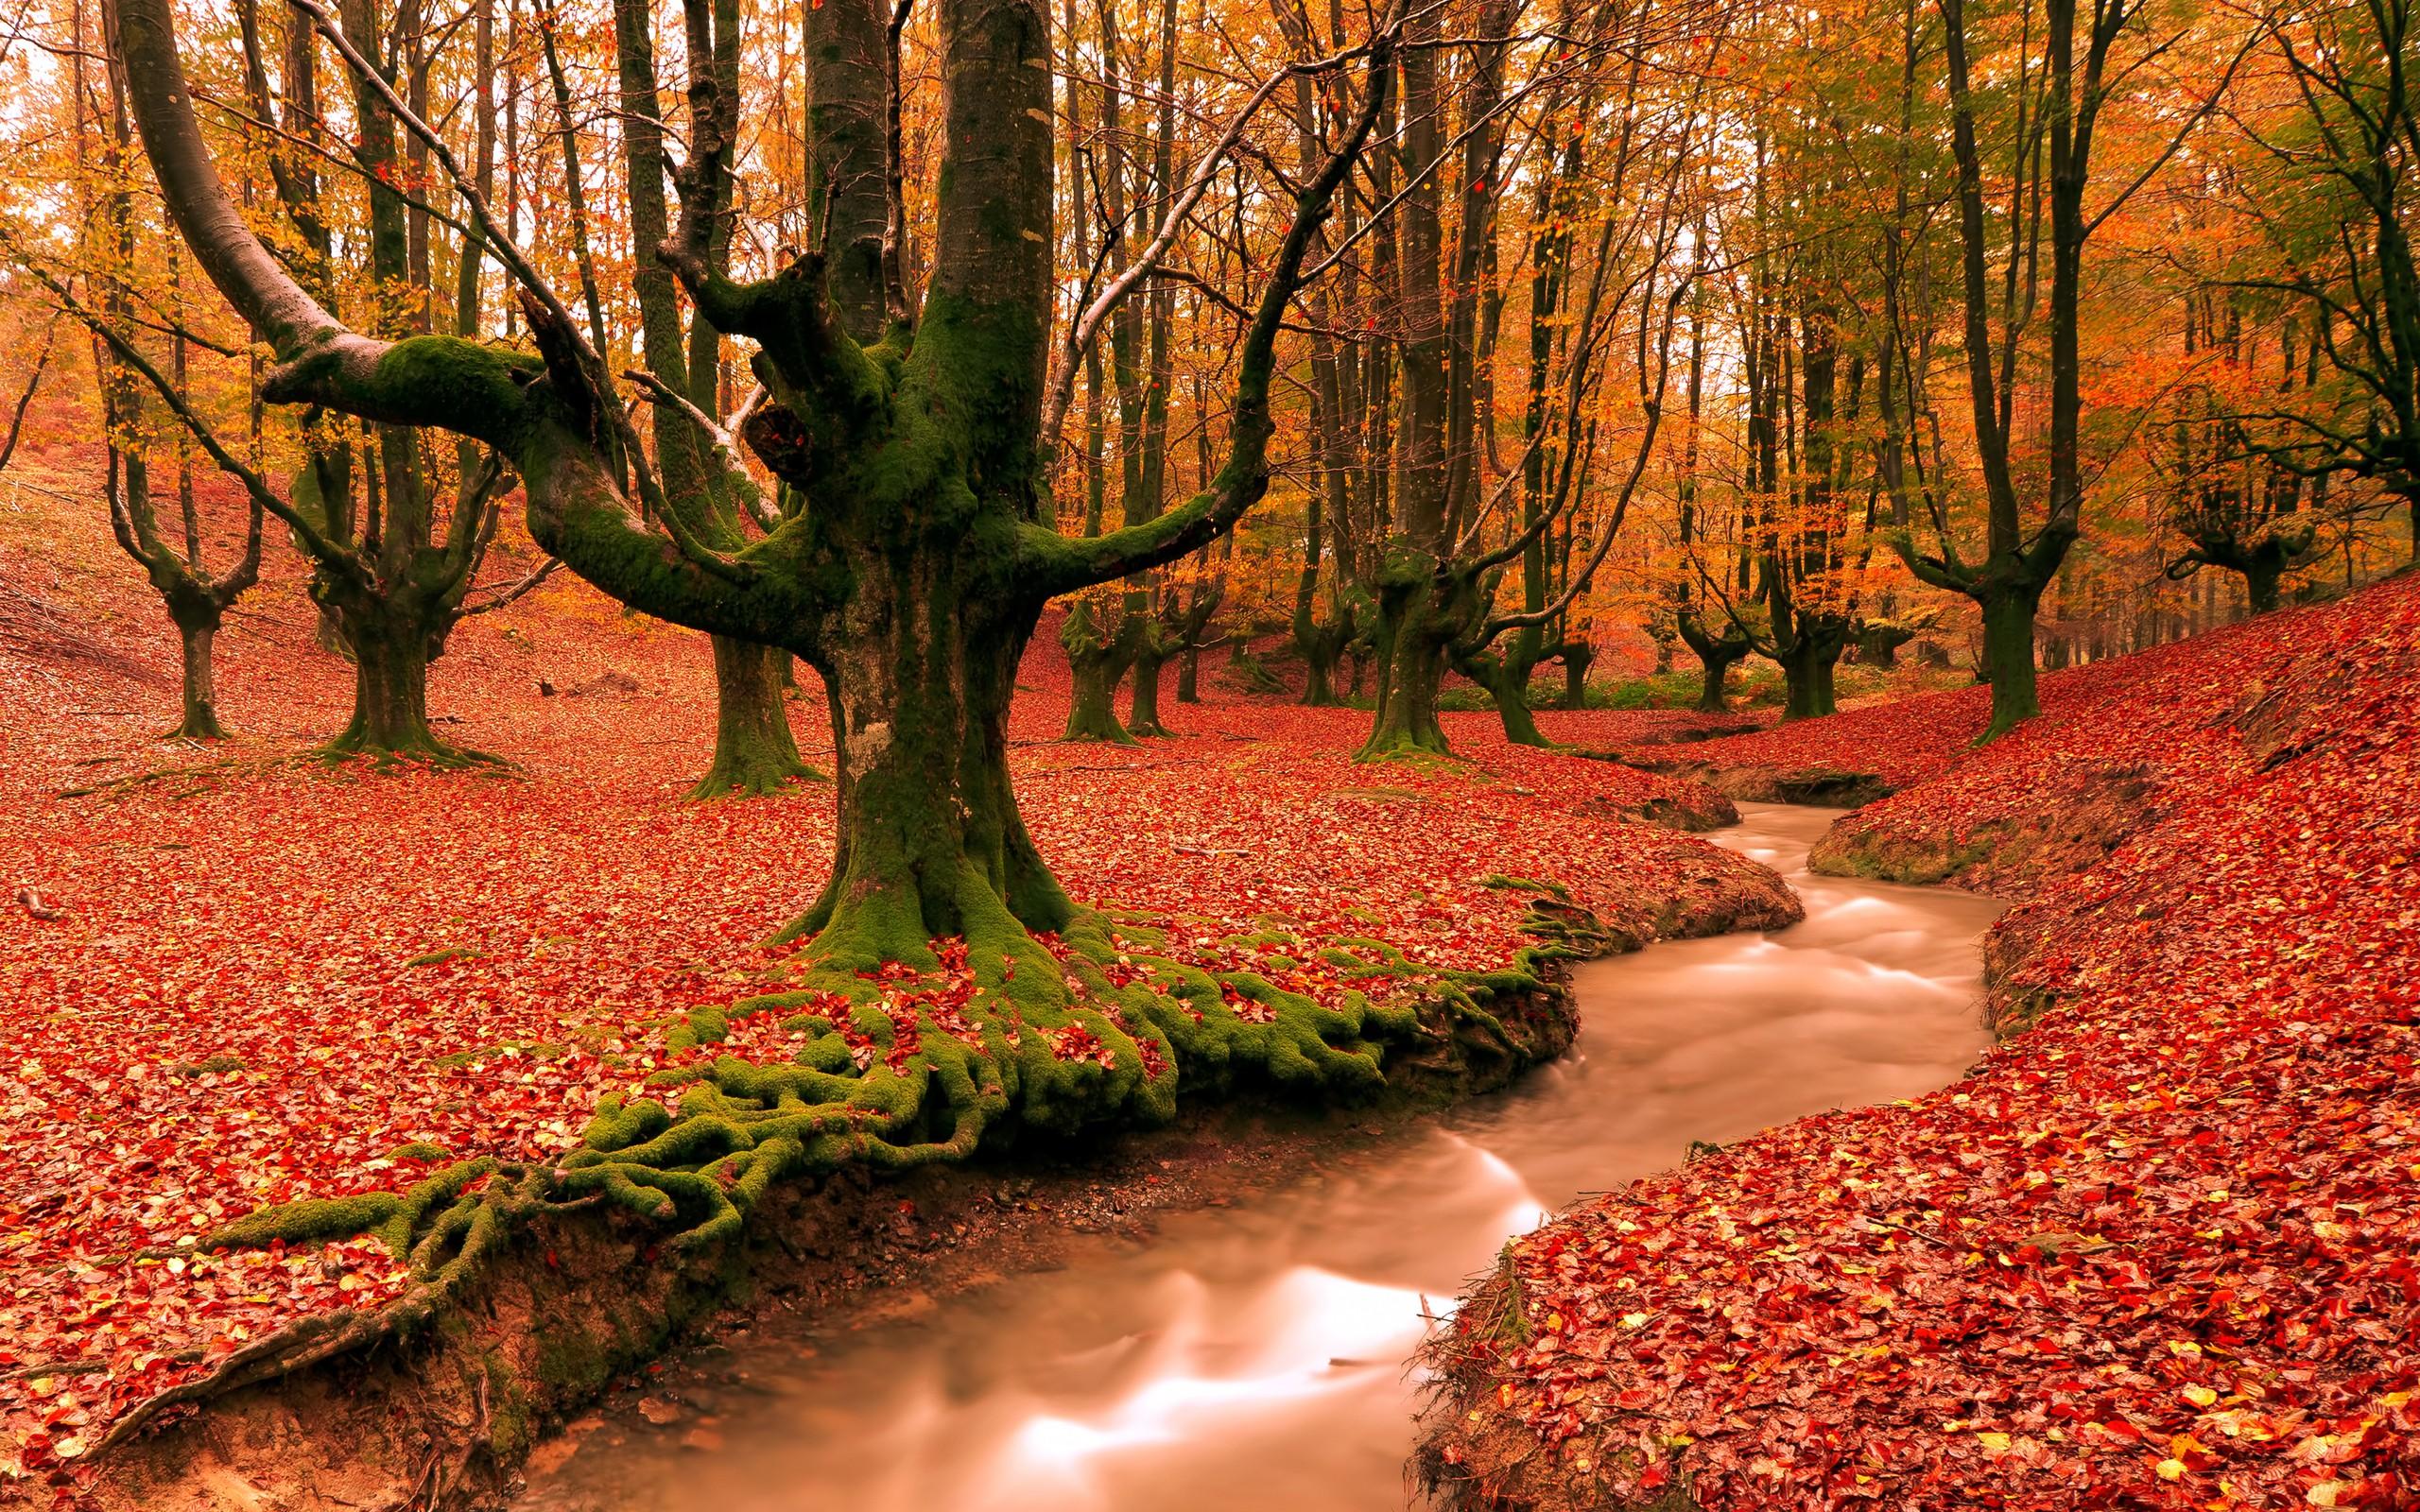 Autumn Desktop Wallpaper 1 Download Free Stunning Full HD